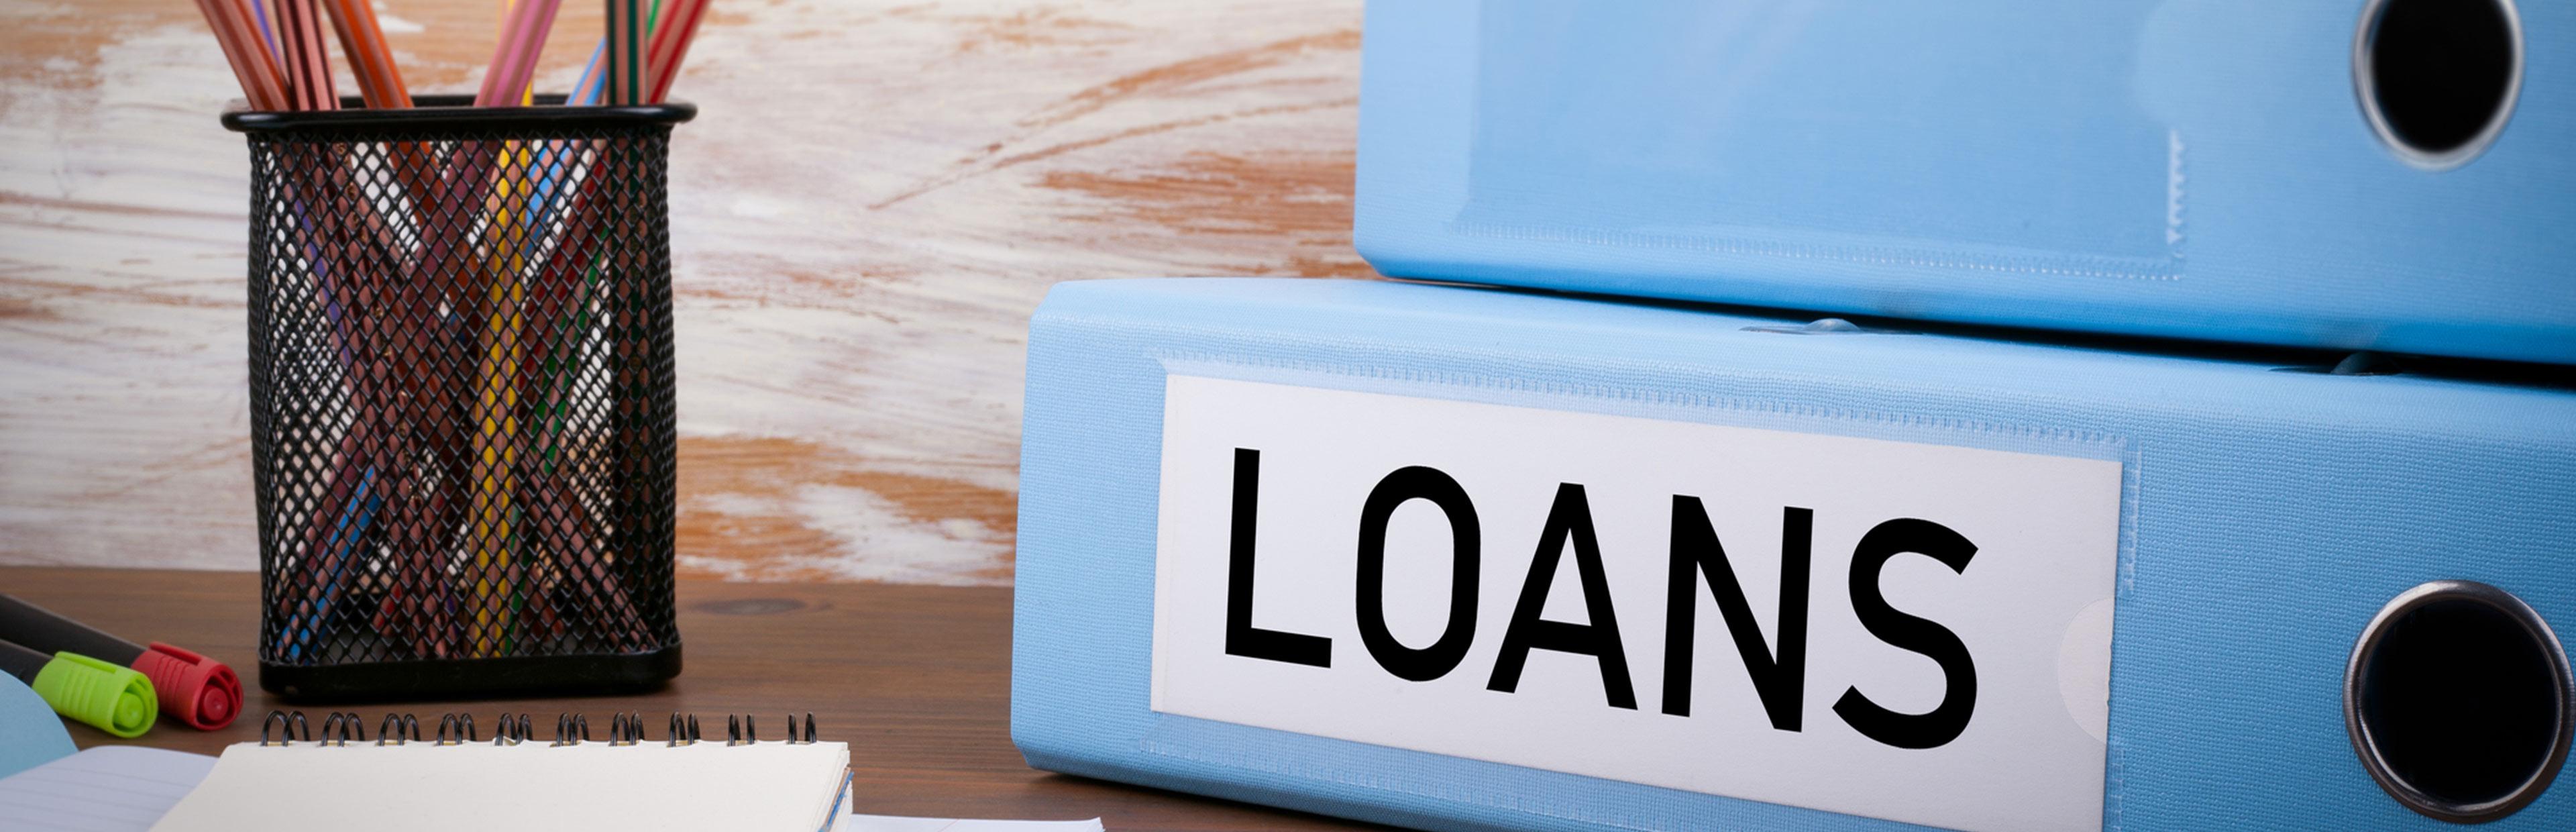 hsbc personal loan interest rates in sri lanka